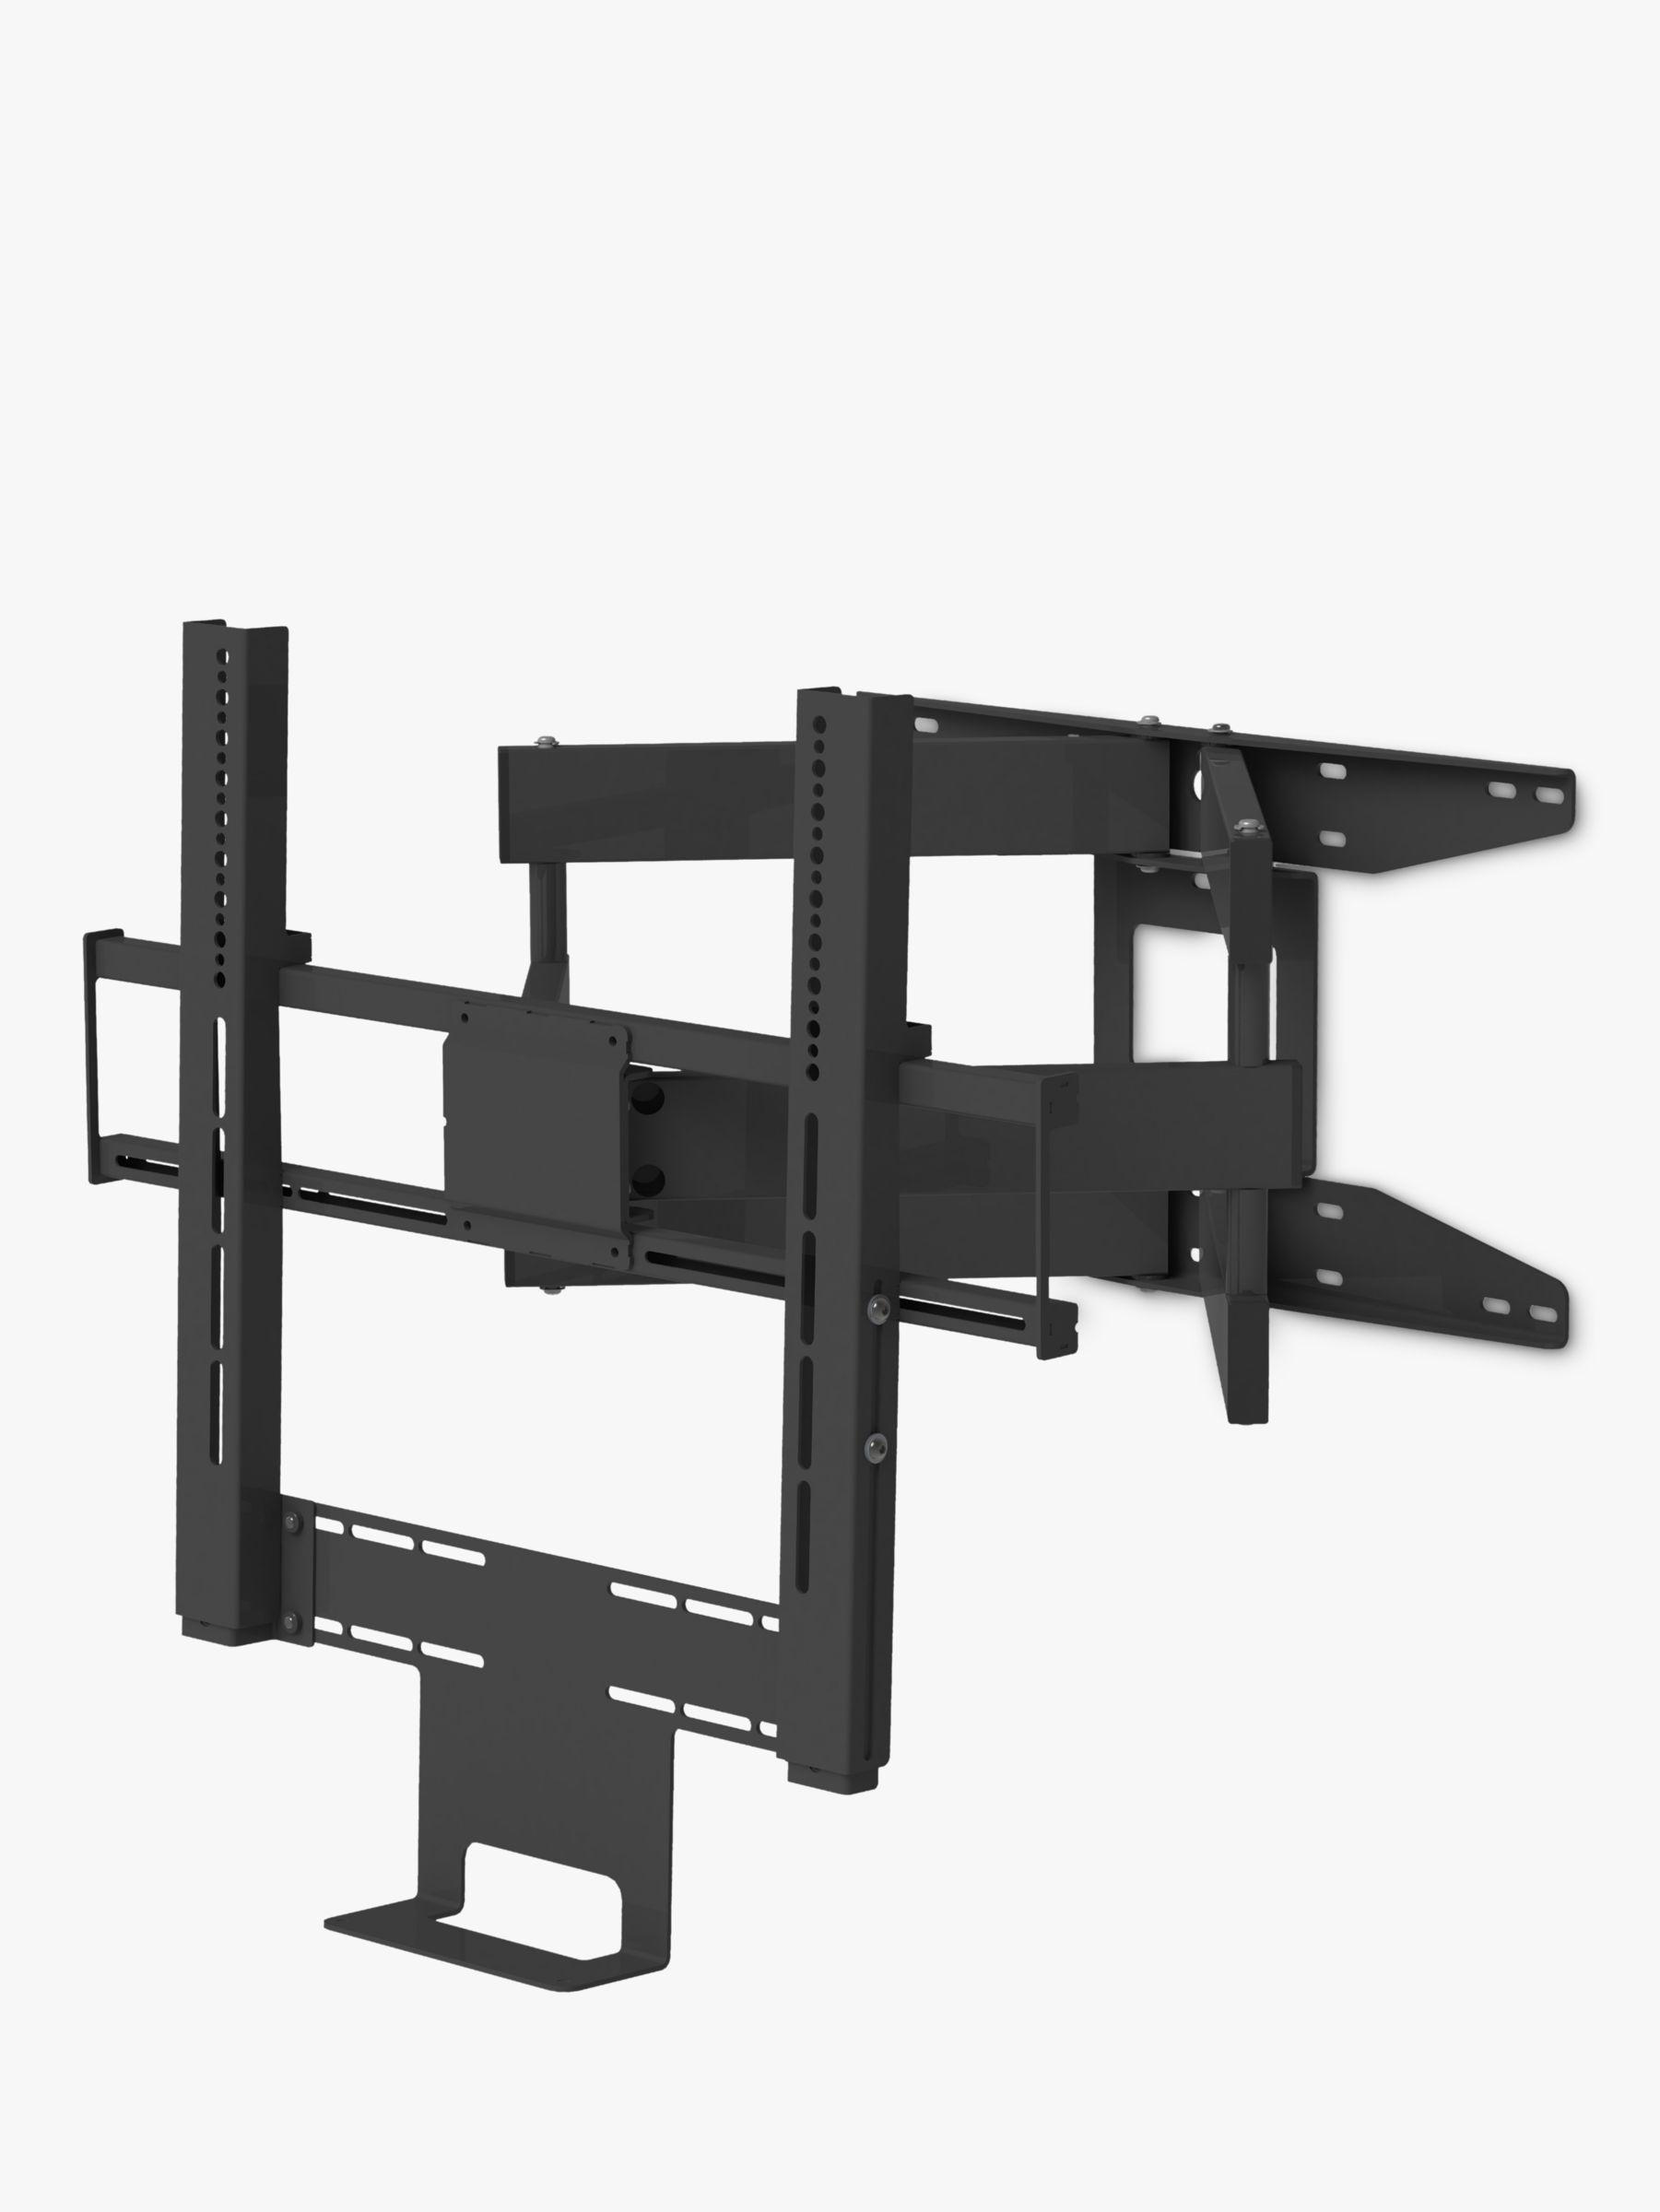 Flexson Flexson Cantilever Wall Mount for TV & Sonos Beam/Playbar, for TVs 40 to 65